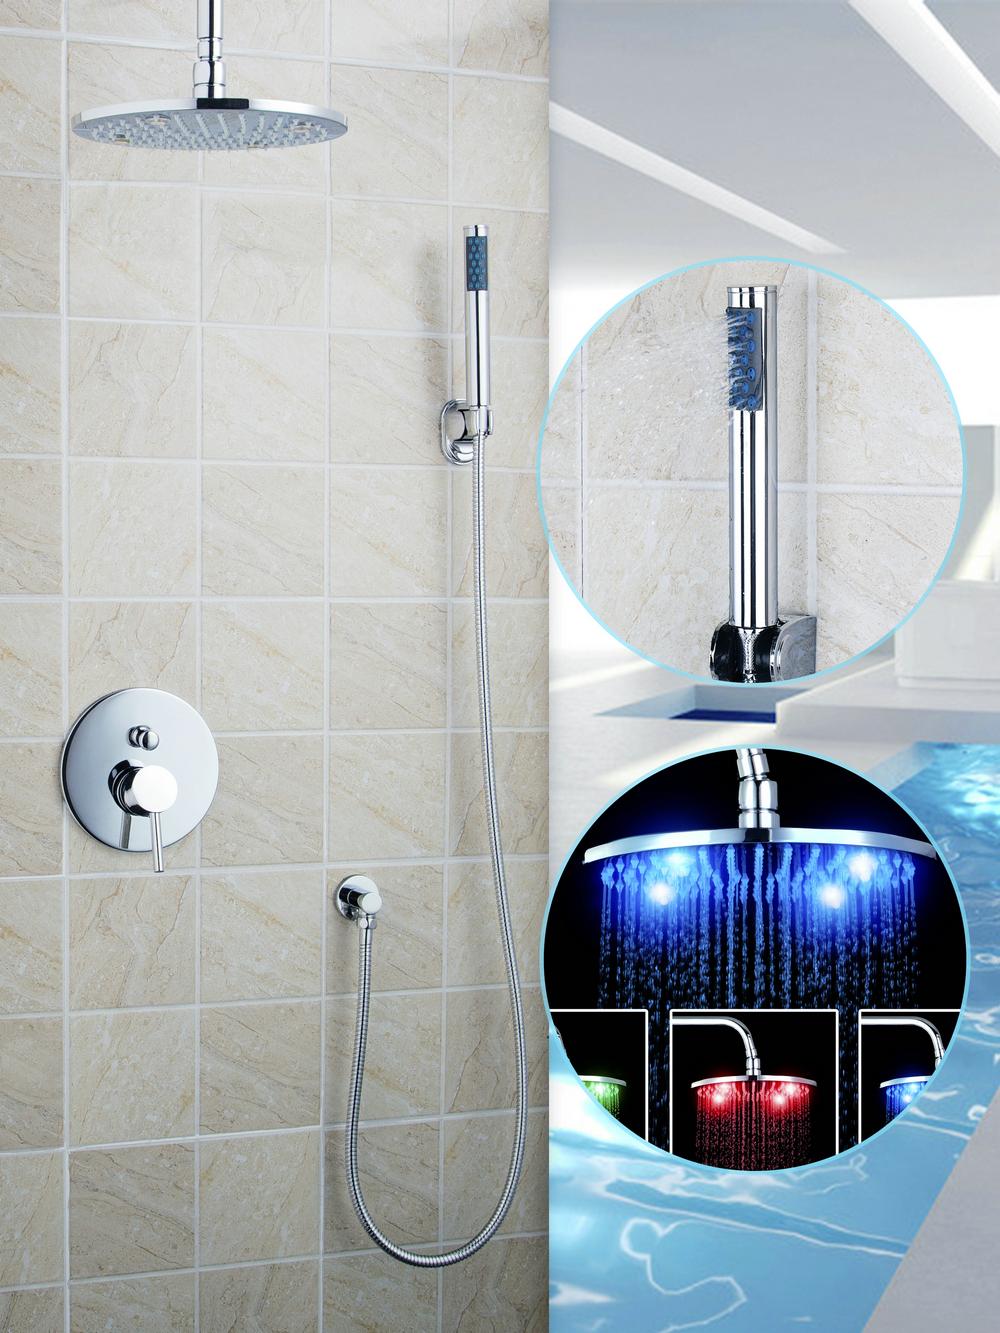 "CoCa Bath Rain Shower chuveiro Set 10""Ceiling Mount 50247-22B/1 Shower Head+Shower Arm+Hand Shower+Mixer Tap Faucet Valve Chrome(China (Mainland))"